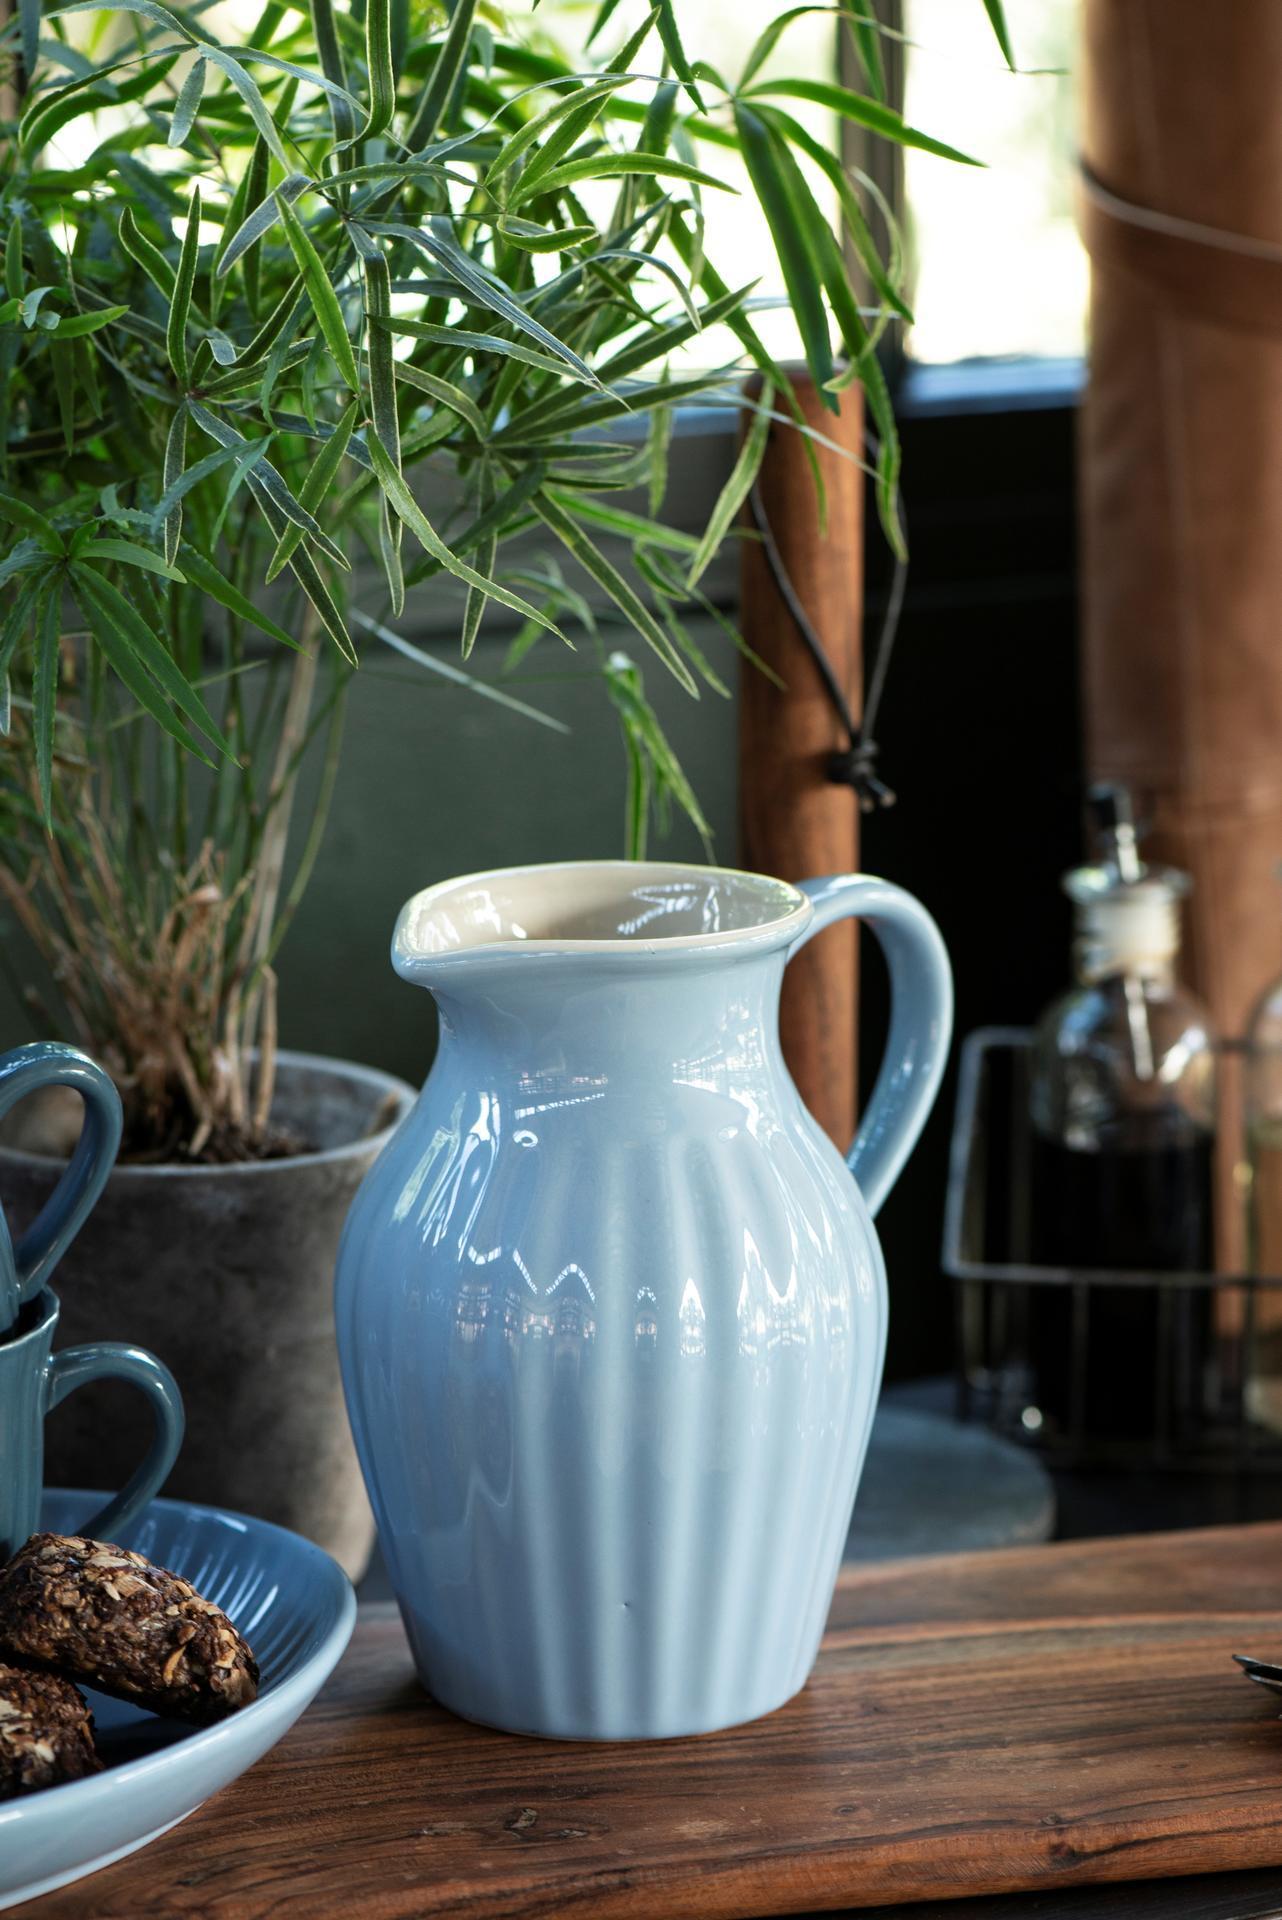 IB LAURSEN Džbán Mynte Nordic sky 1,7 l, modrá barva, keramika